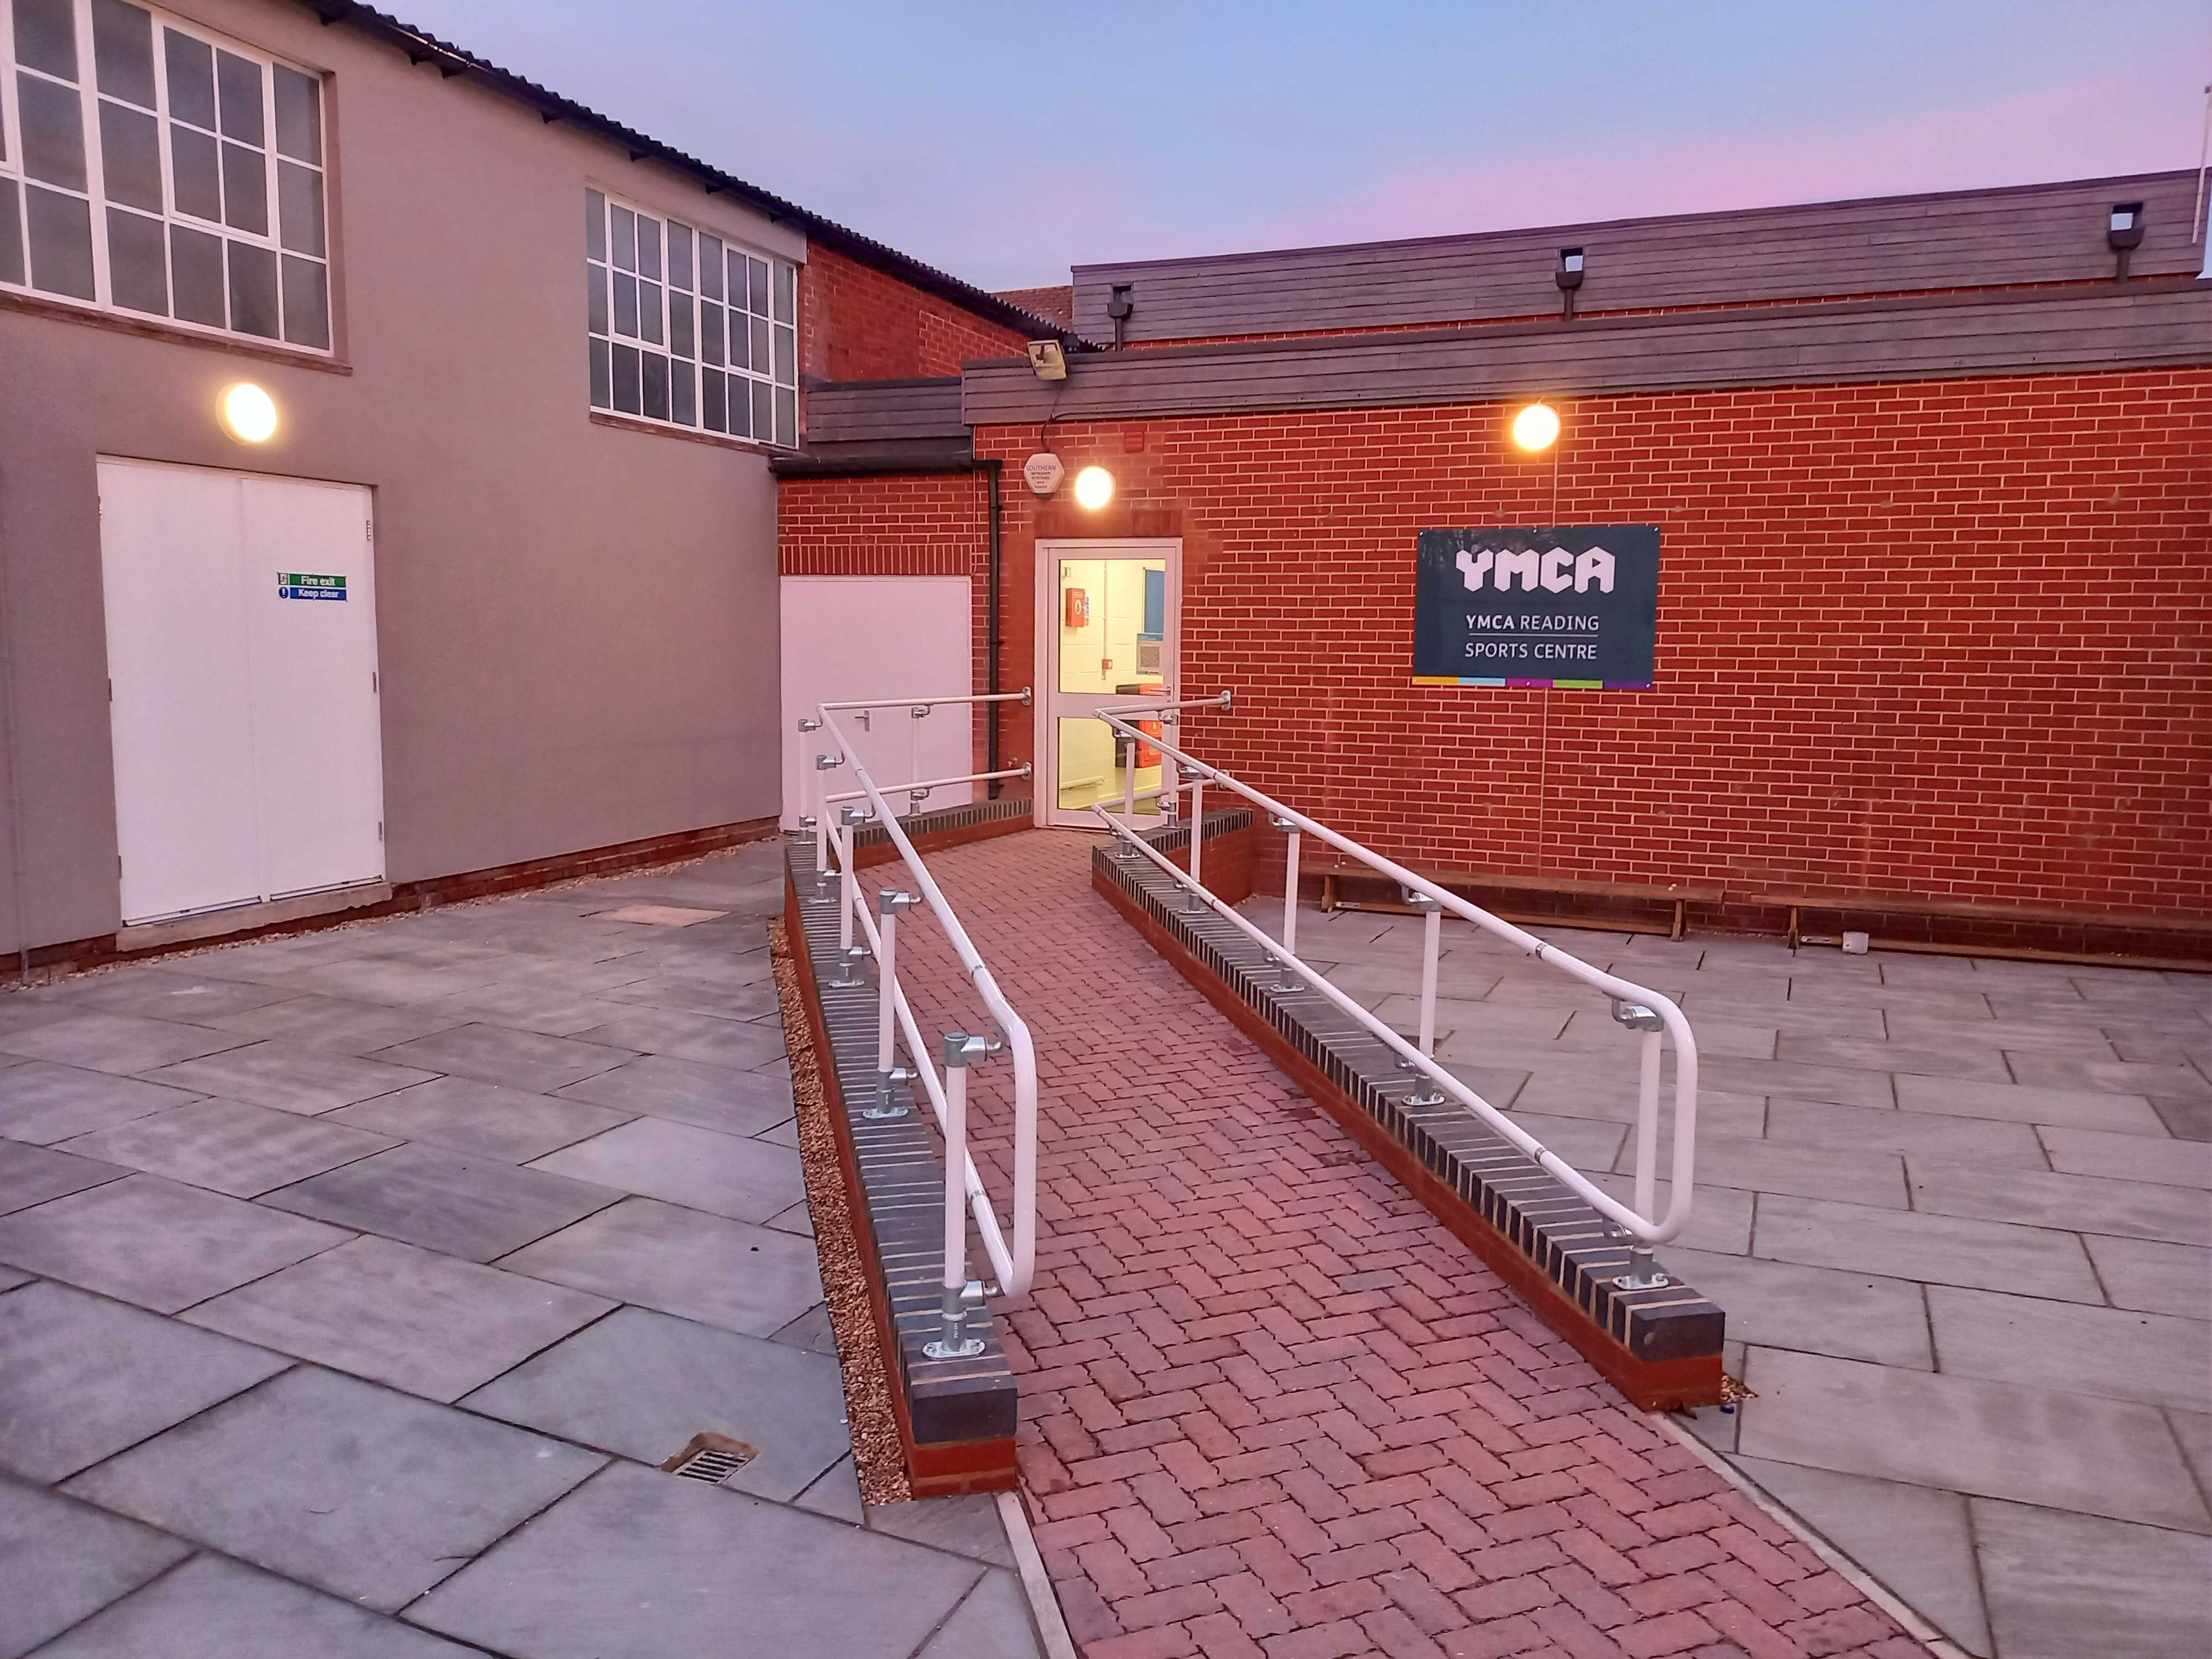 YMCA Reading Sport Centre Entrance